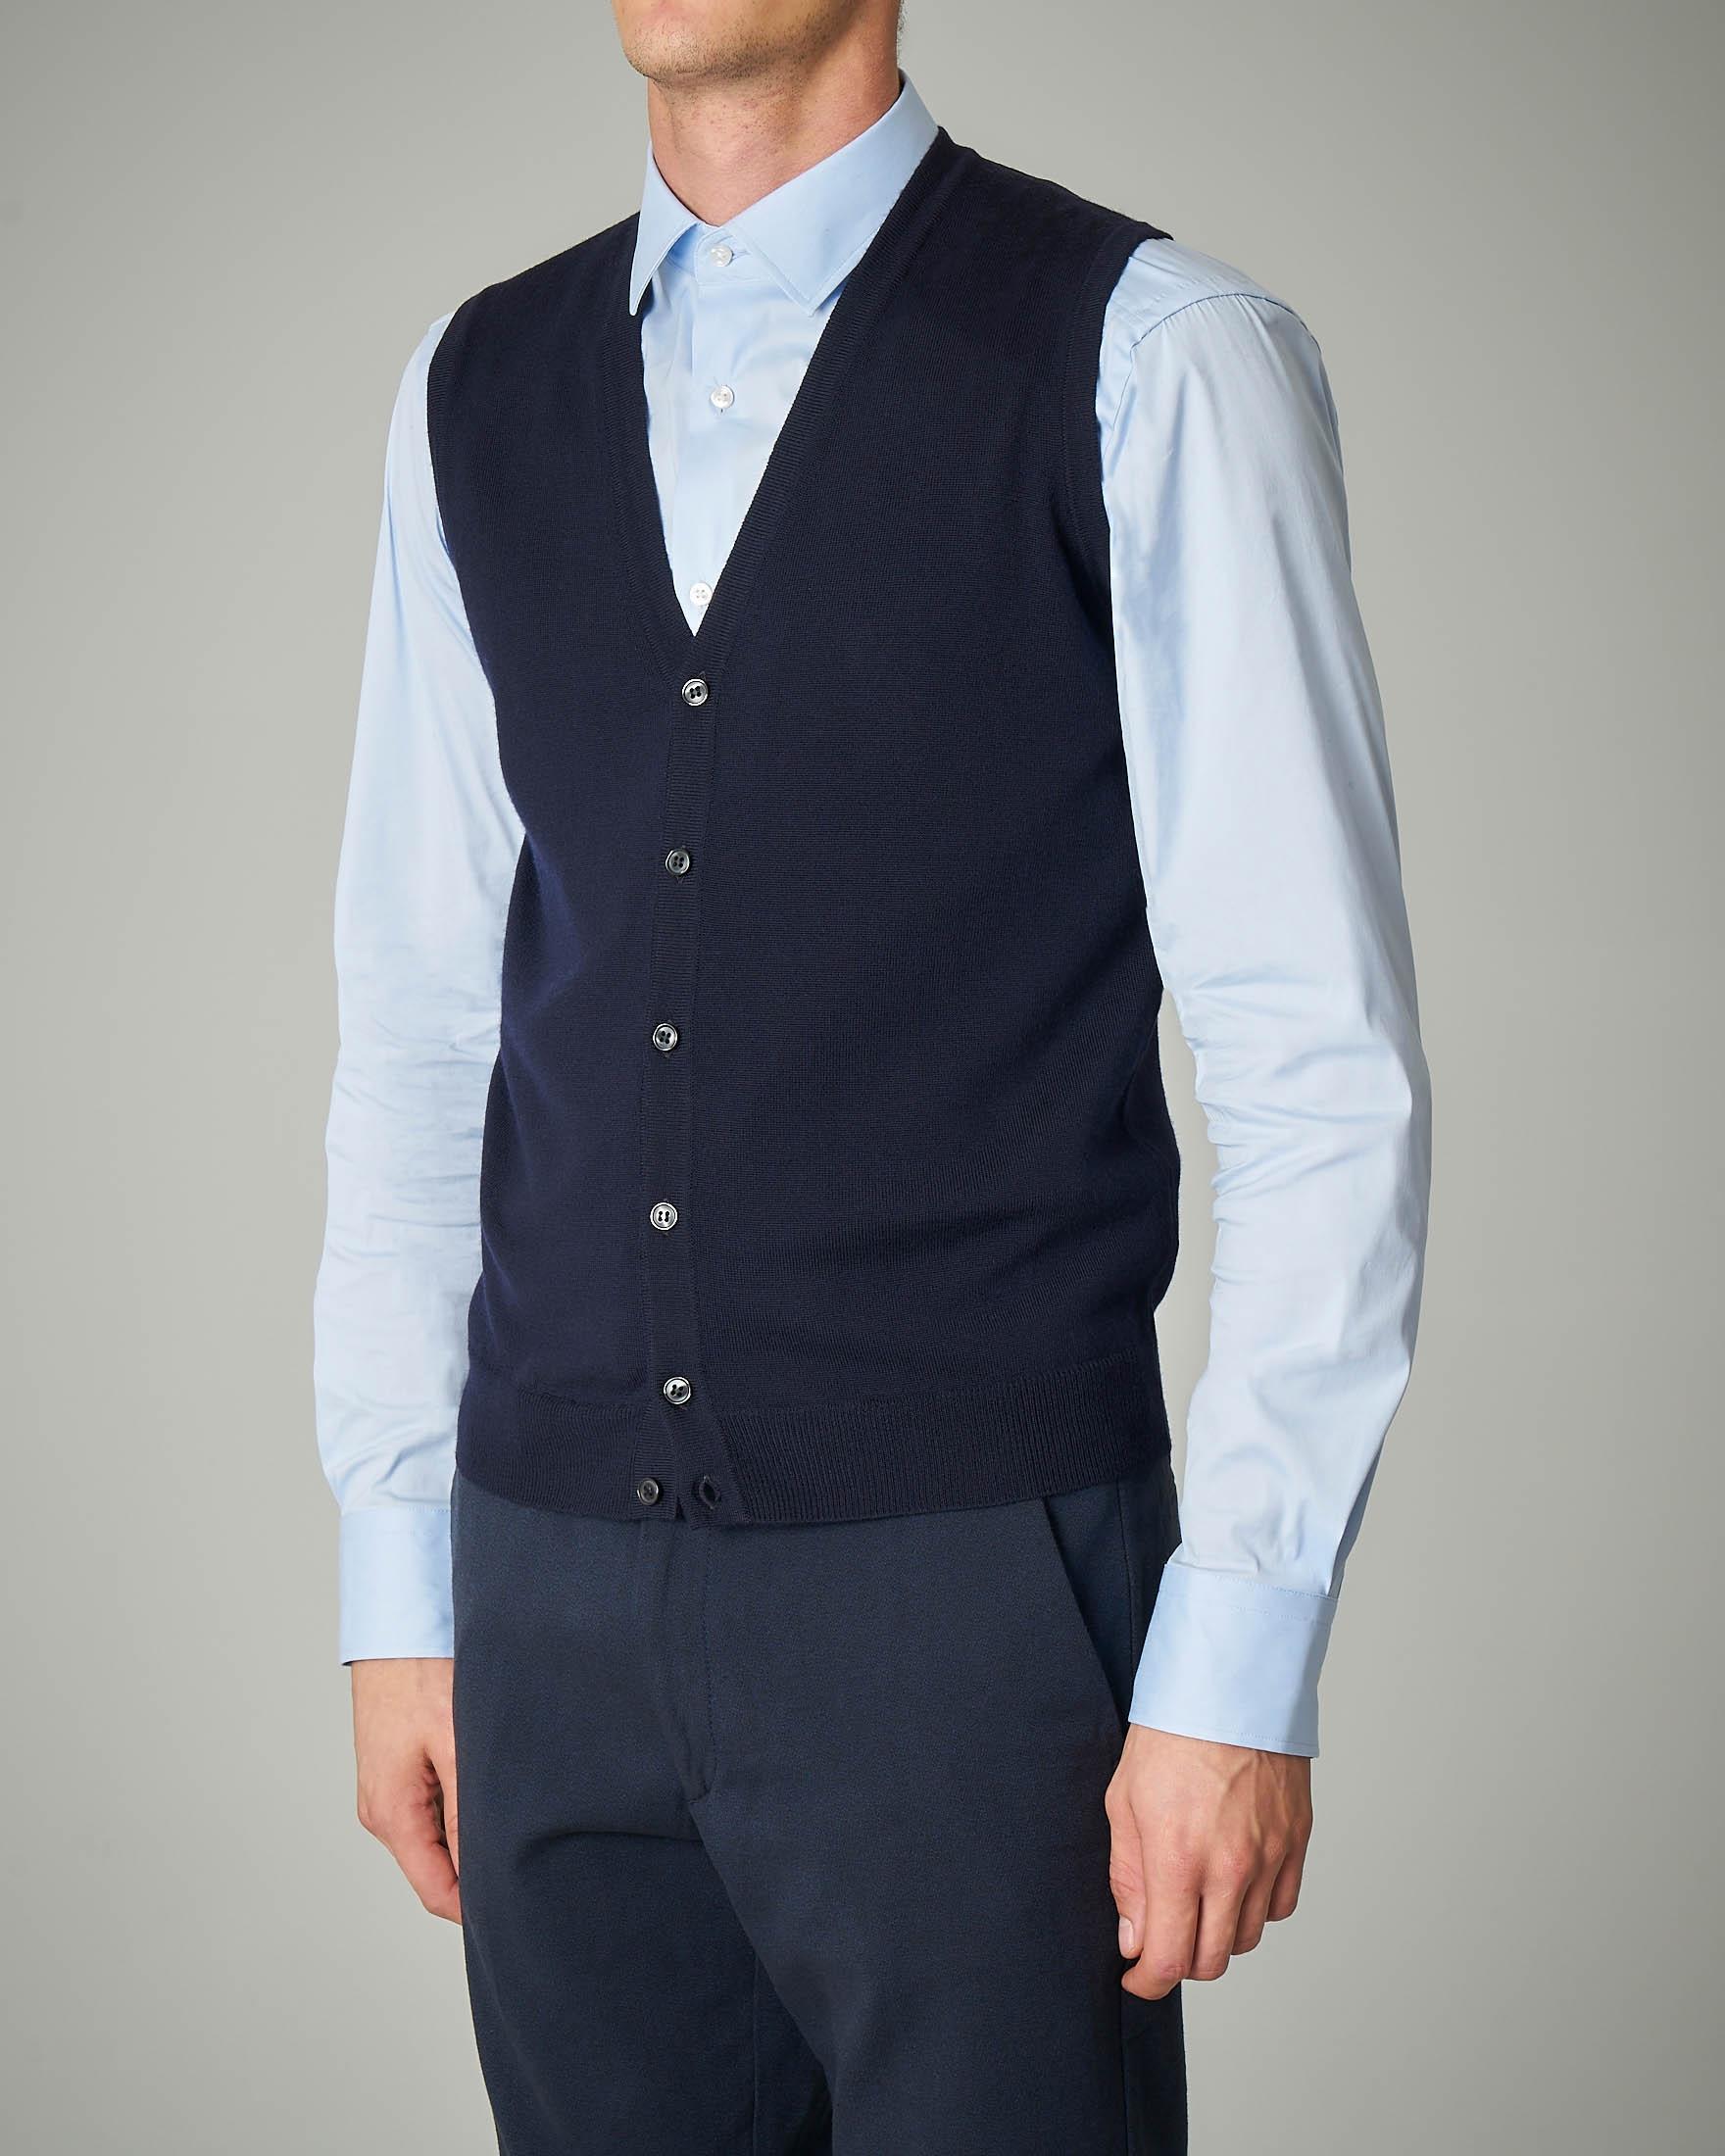 Gilet blu con bottoni in lana merino